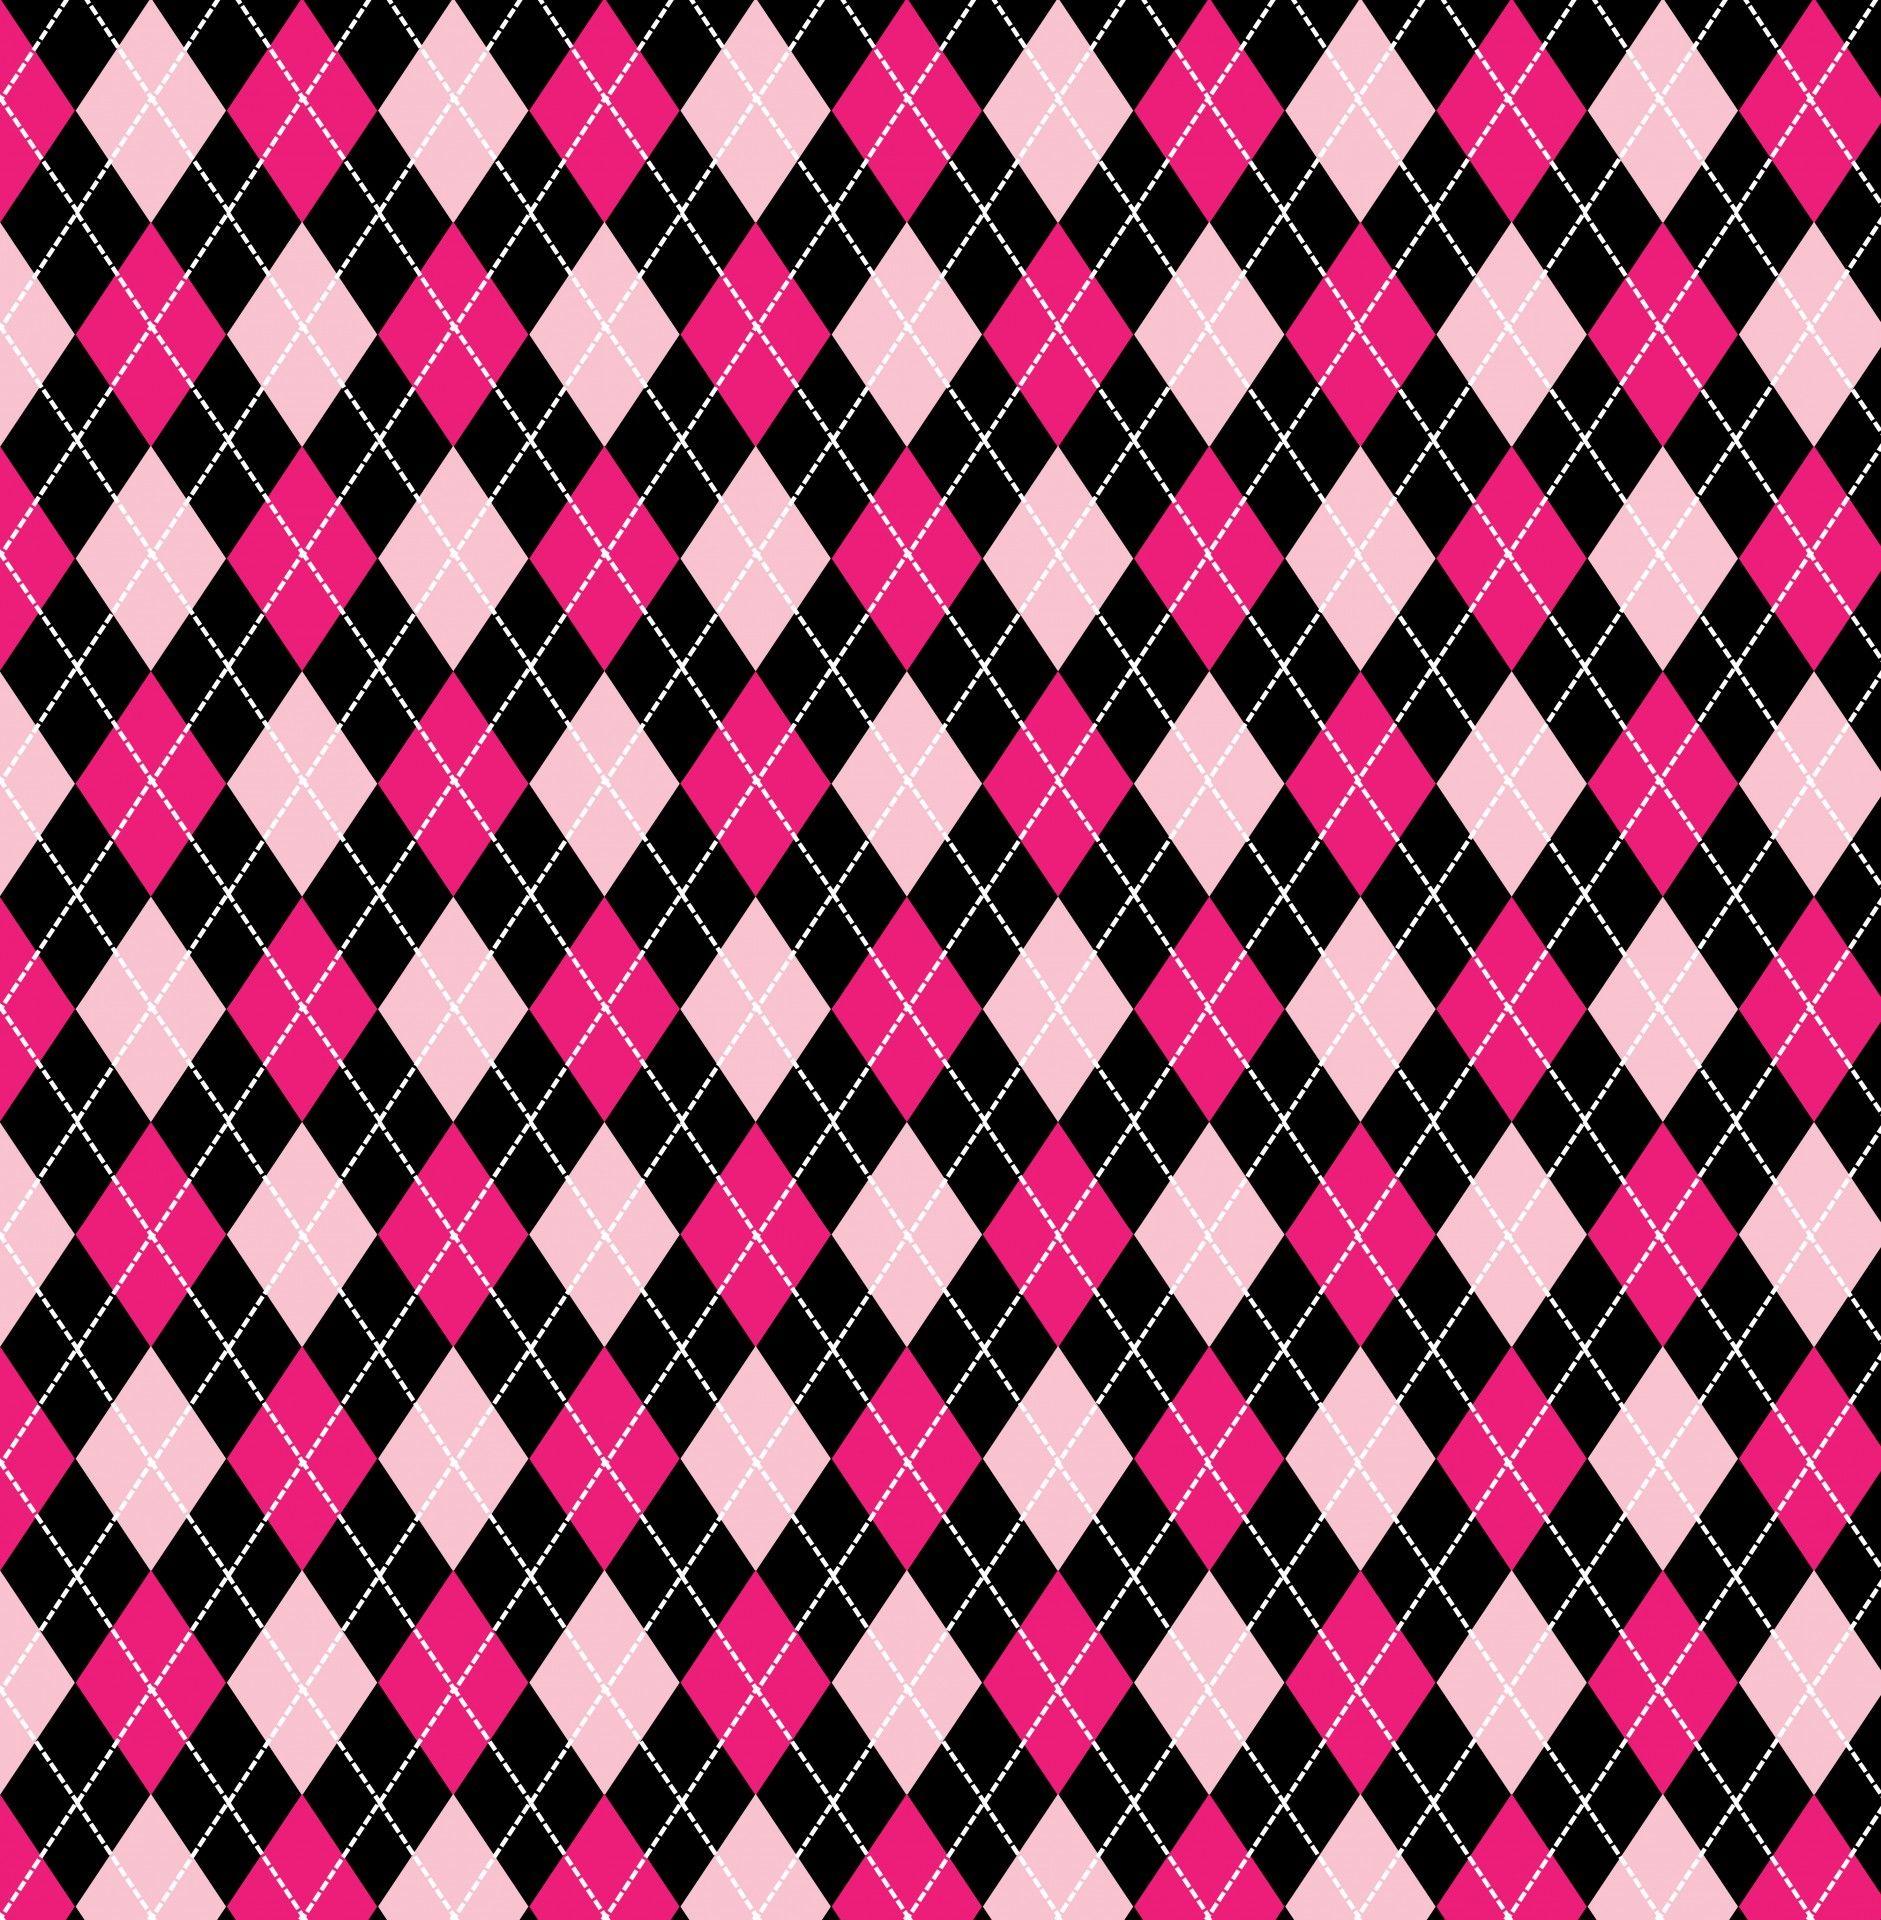 Argyle Argyle Pattern Pink Black By Karen Arnold Argyle Pattern Pattern Wallpaper